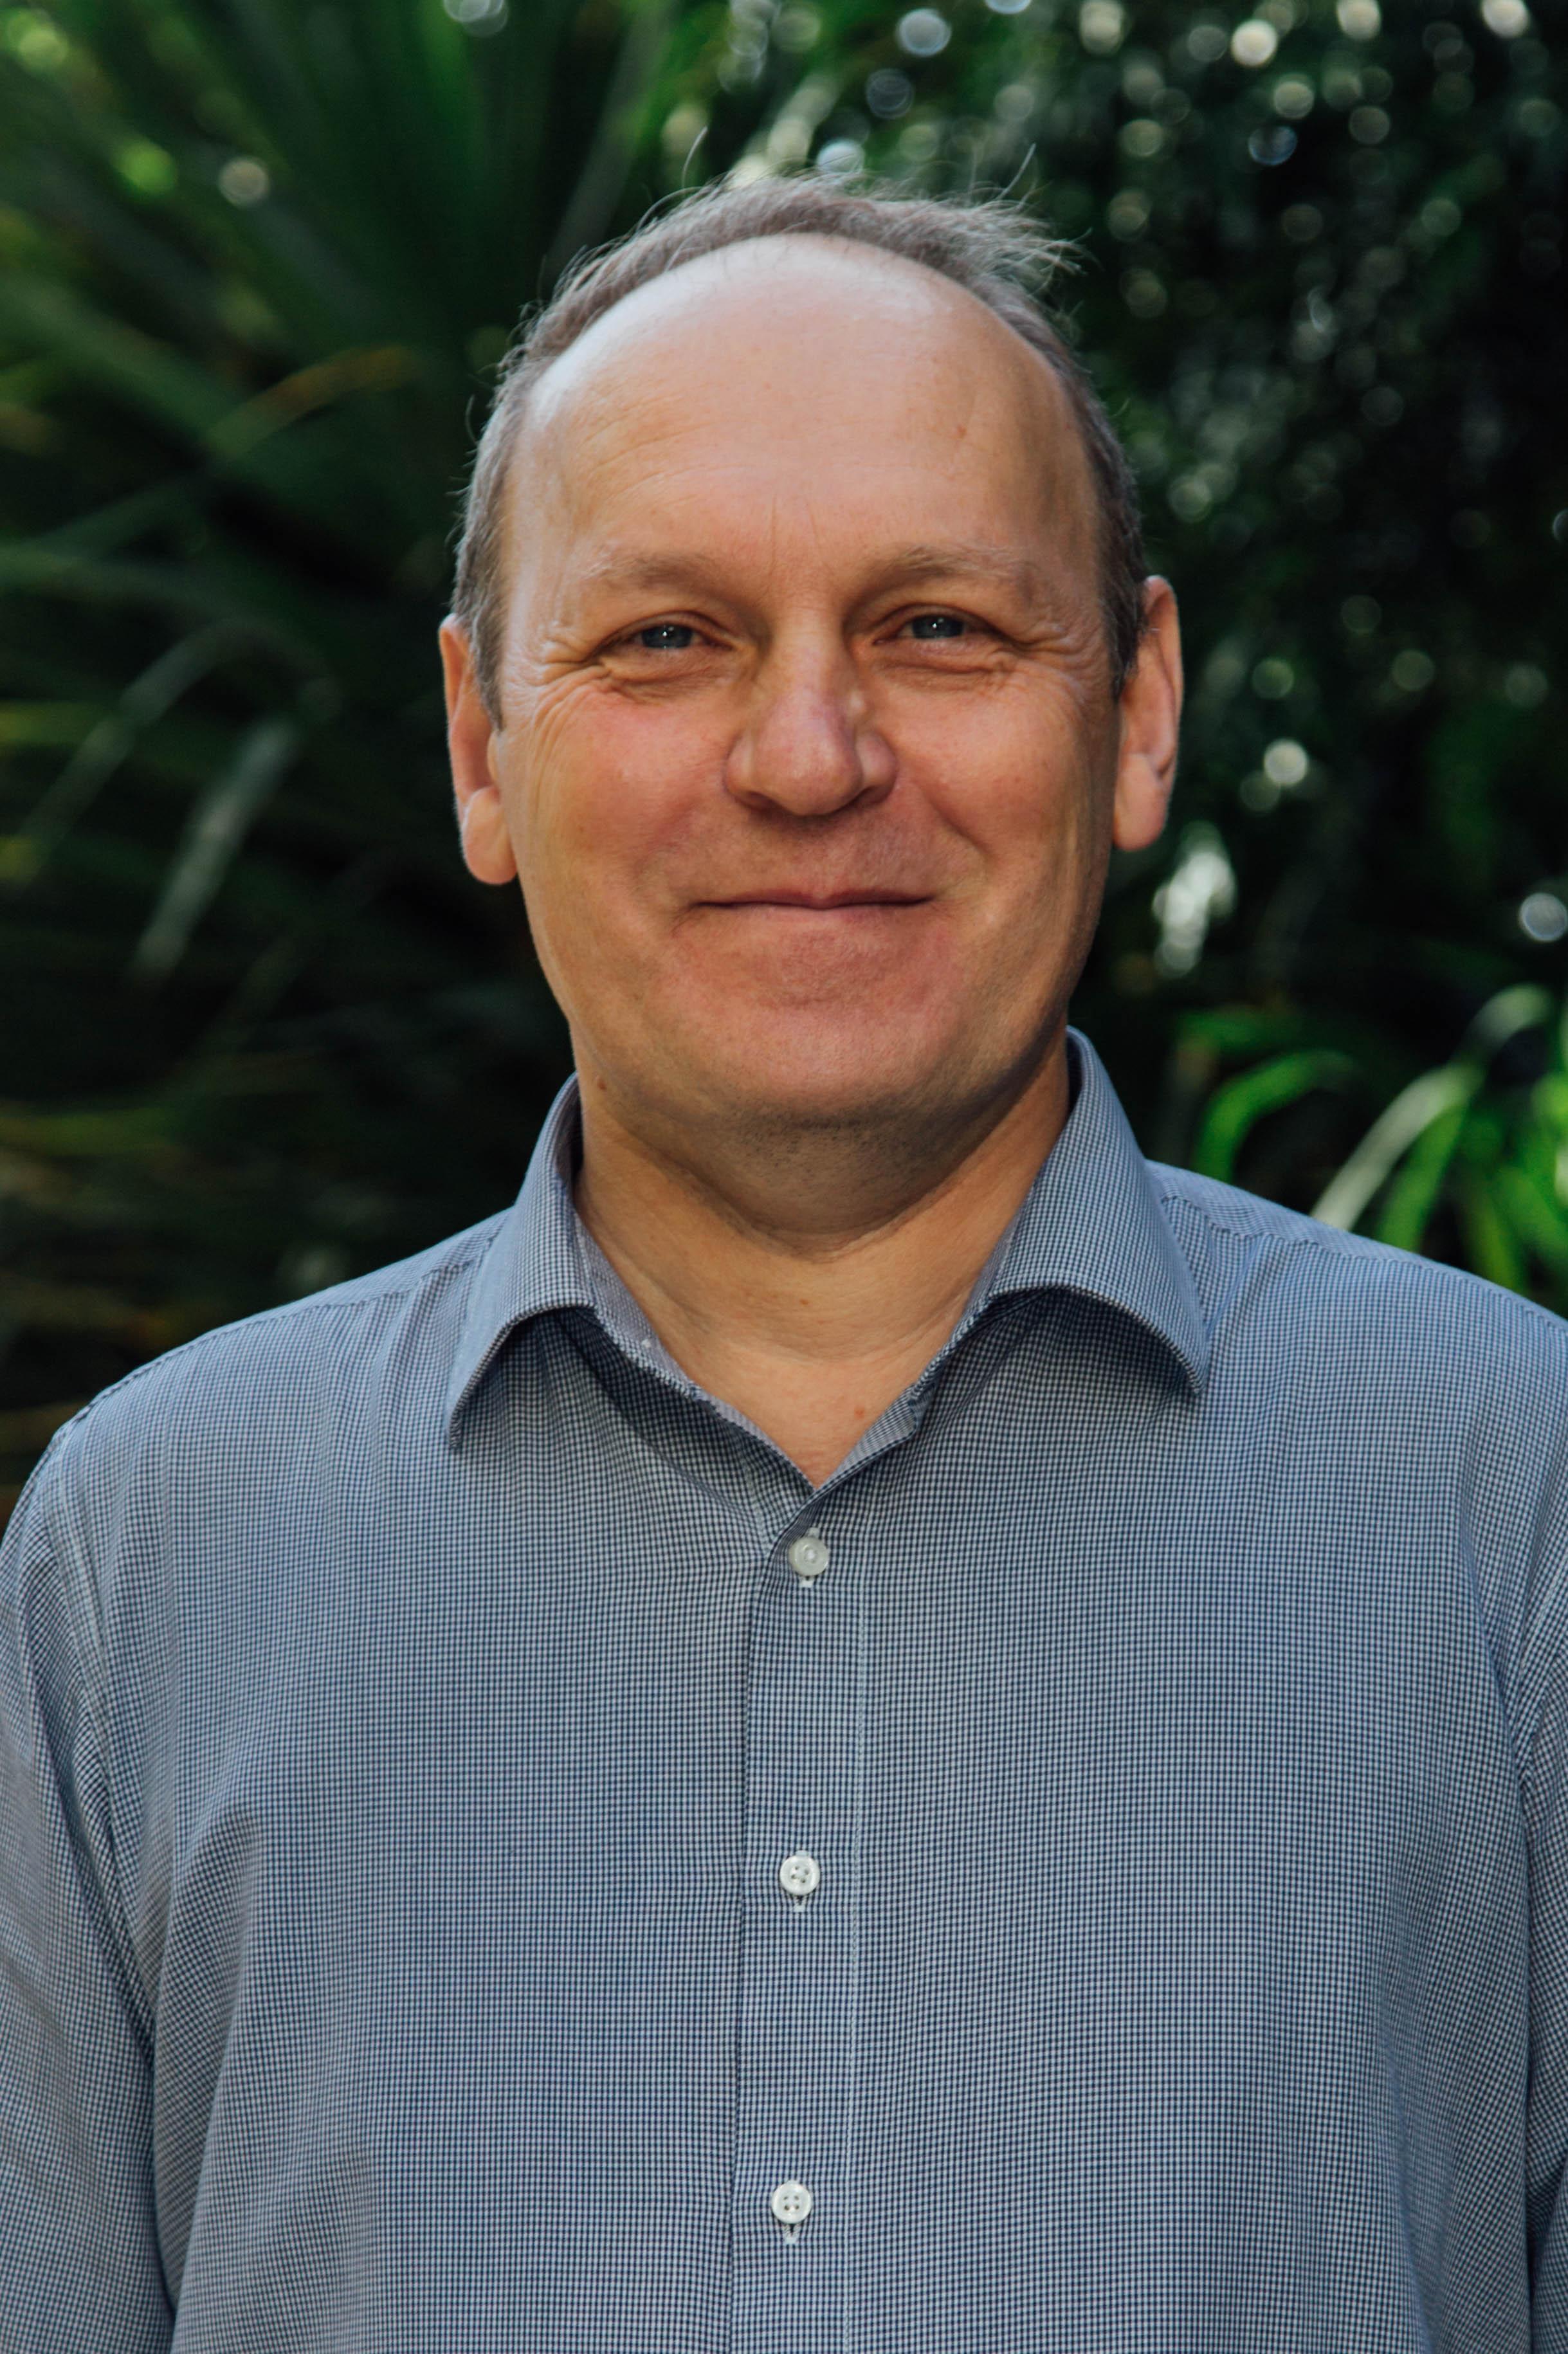 Vladimir Potapov - Support/Developer